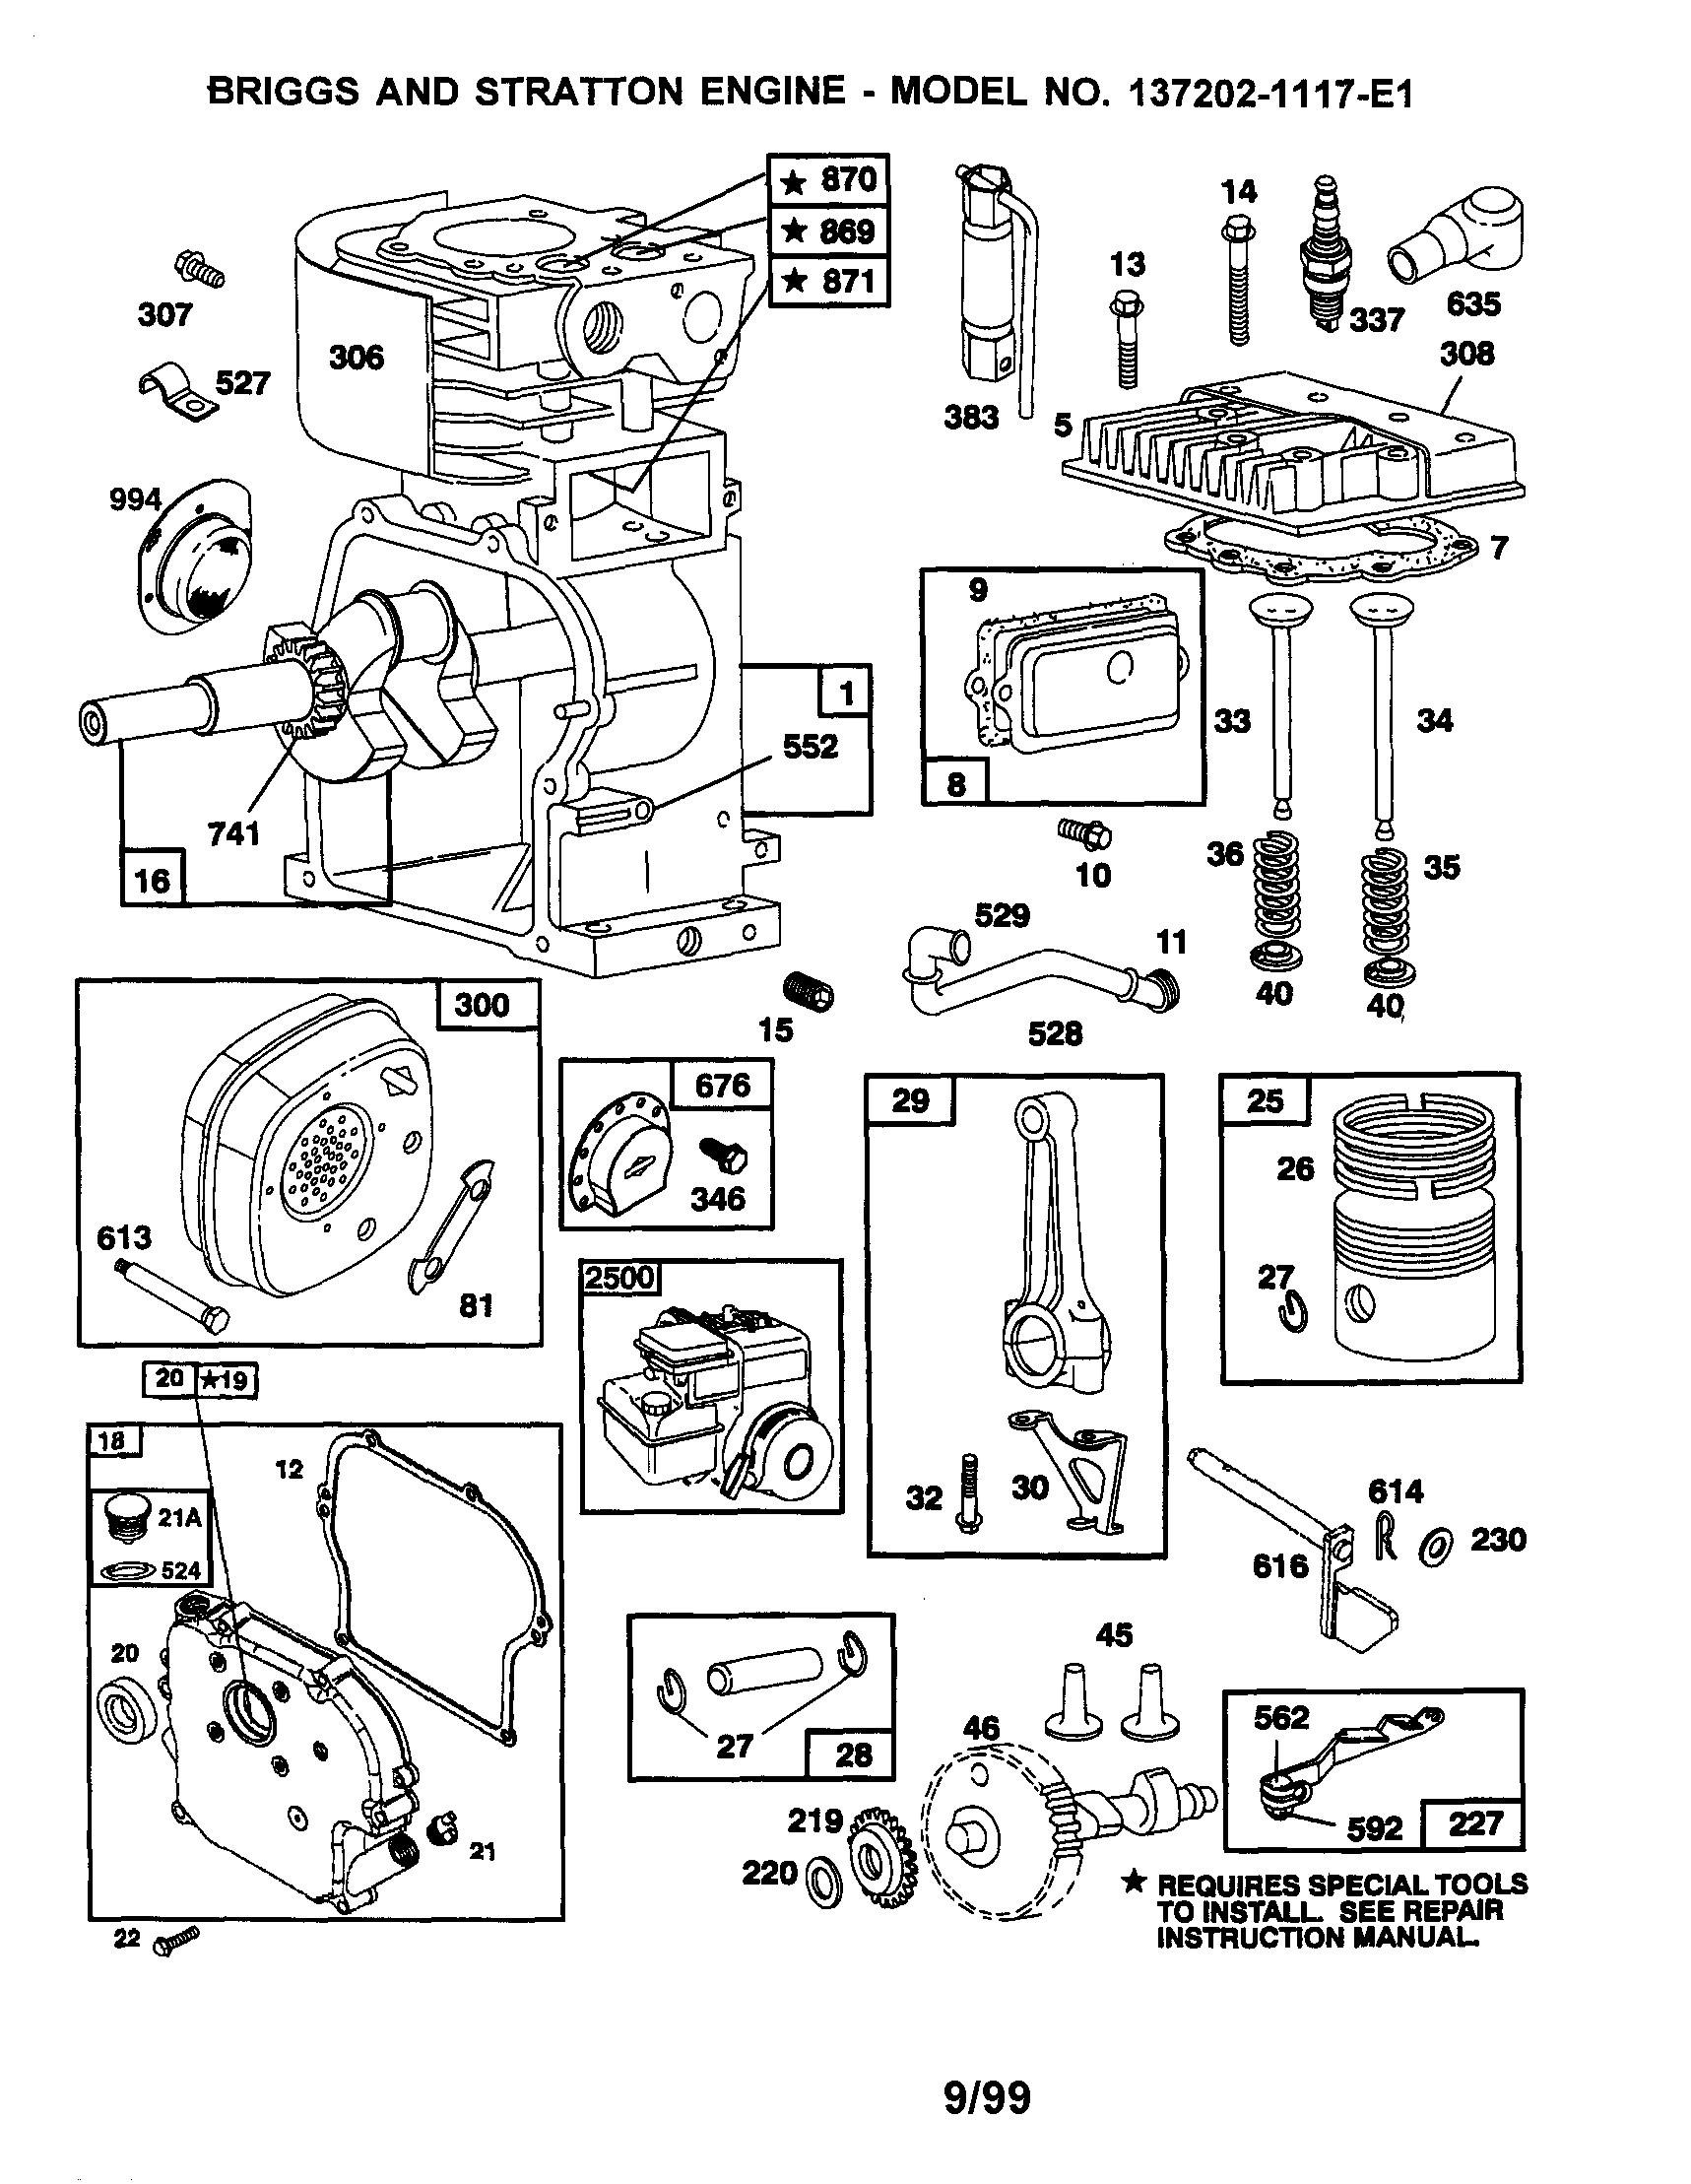 Briggs stratton parts diagram magnificent briggs and stratton engine briggs stratton parts diagram magnificent briggs and stratton engine parts breakdown of briggs stratton parts diagram swarovskicordoba Choice Image